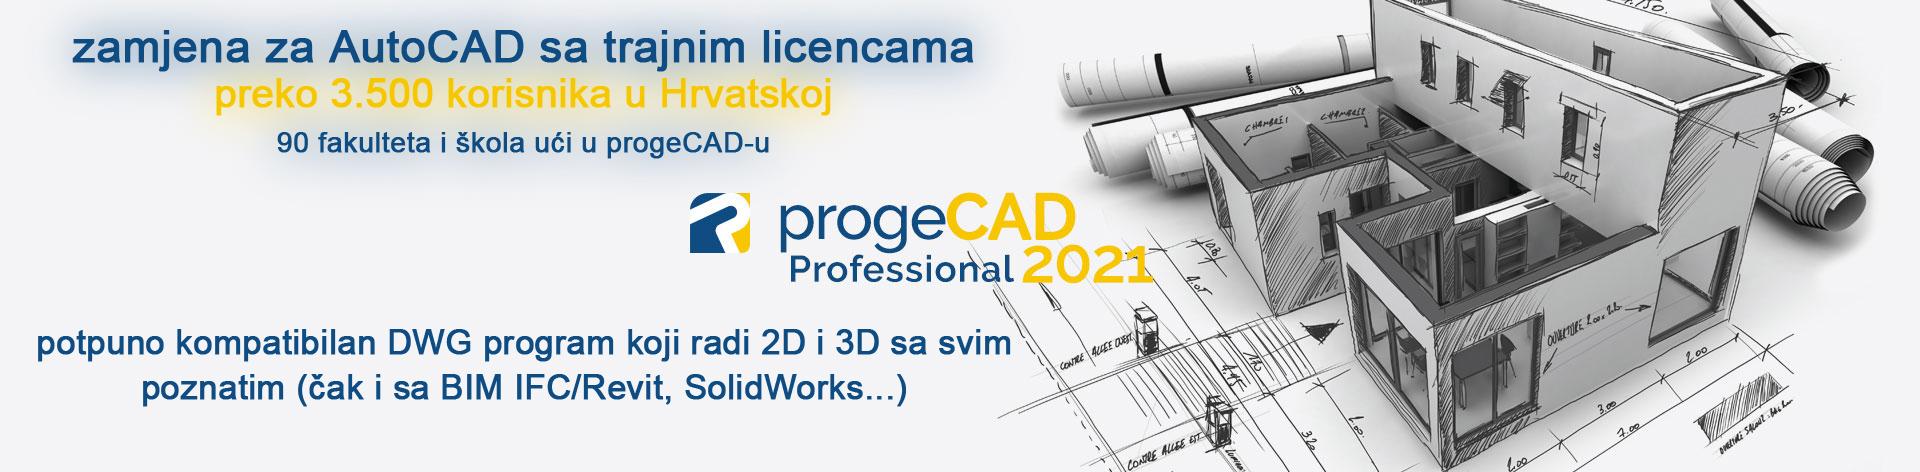 https://www.progecad.com.hr/Repository/BANERI/header_progecad_2021_banner.jpg